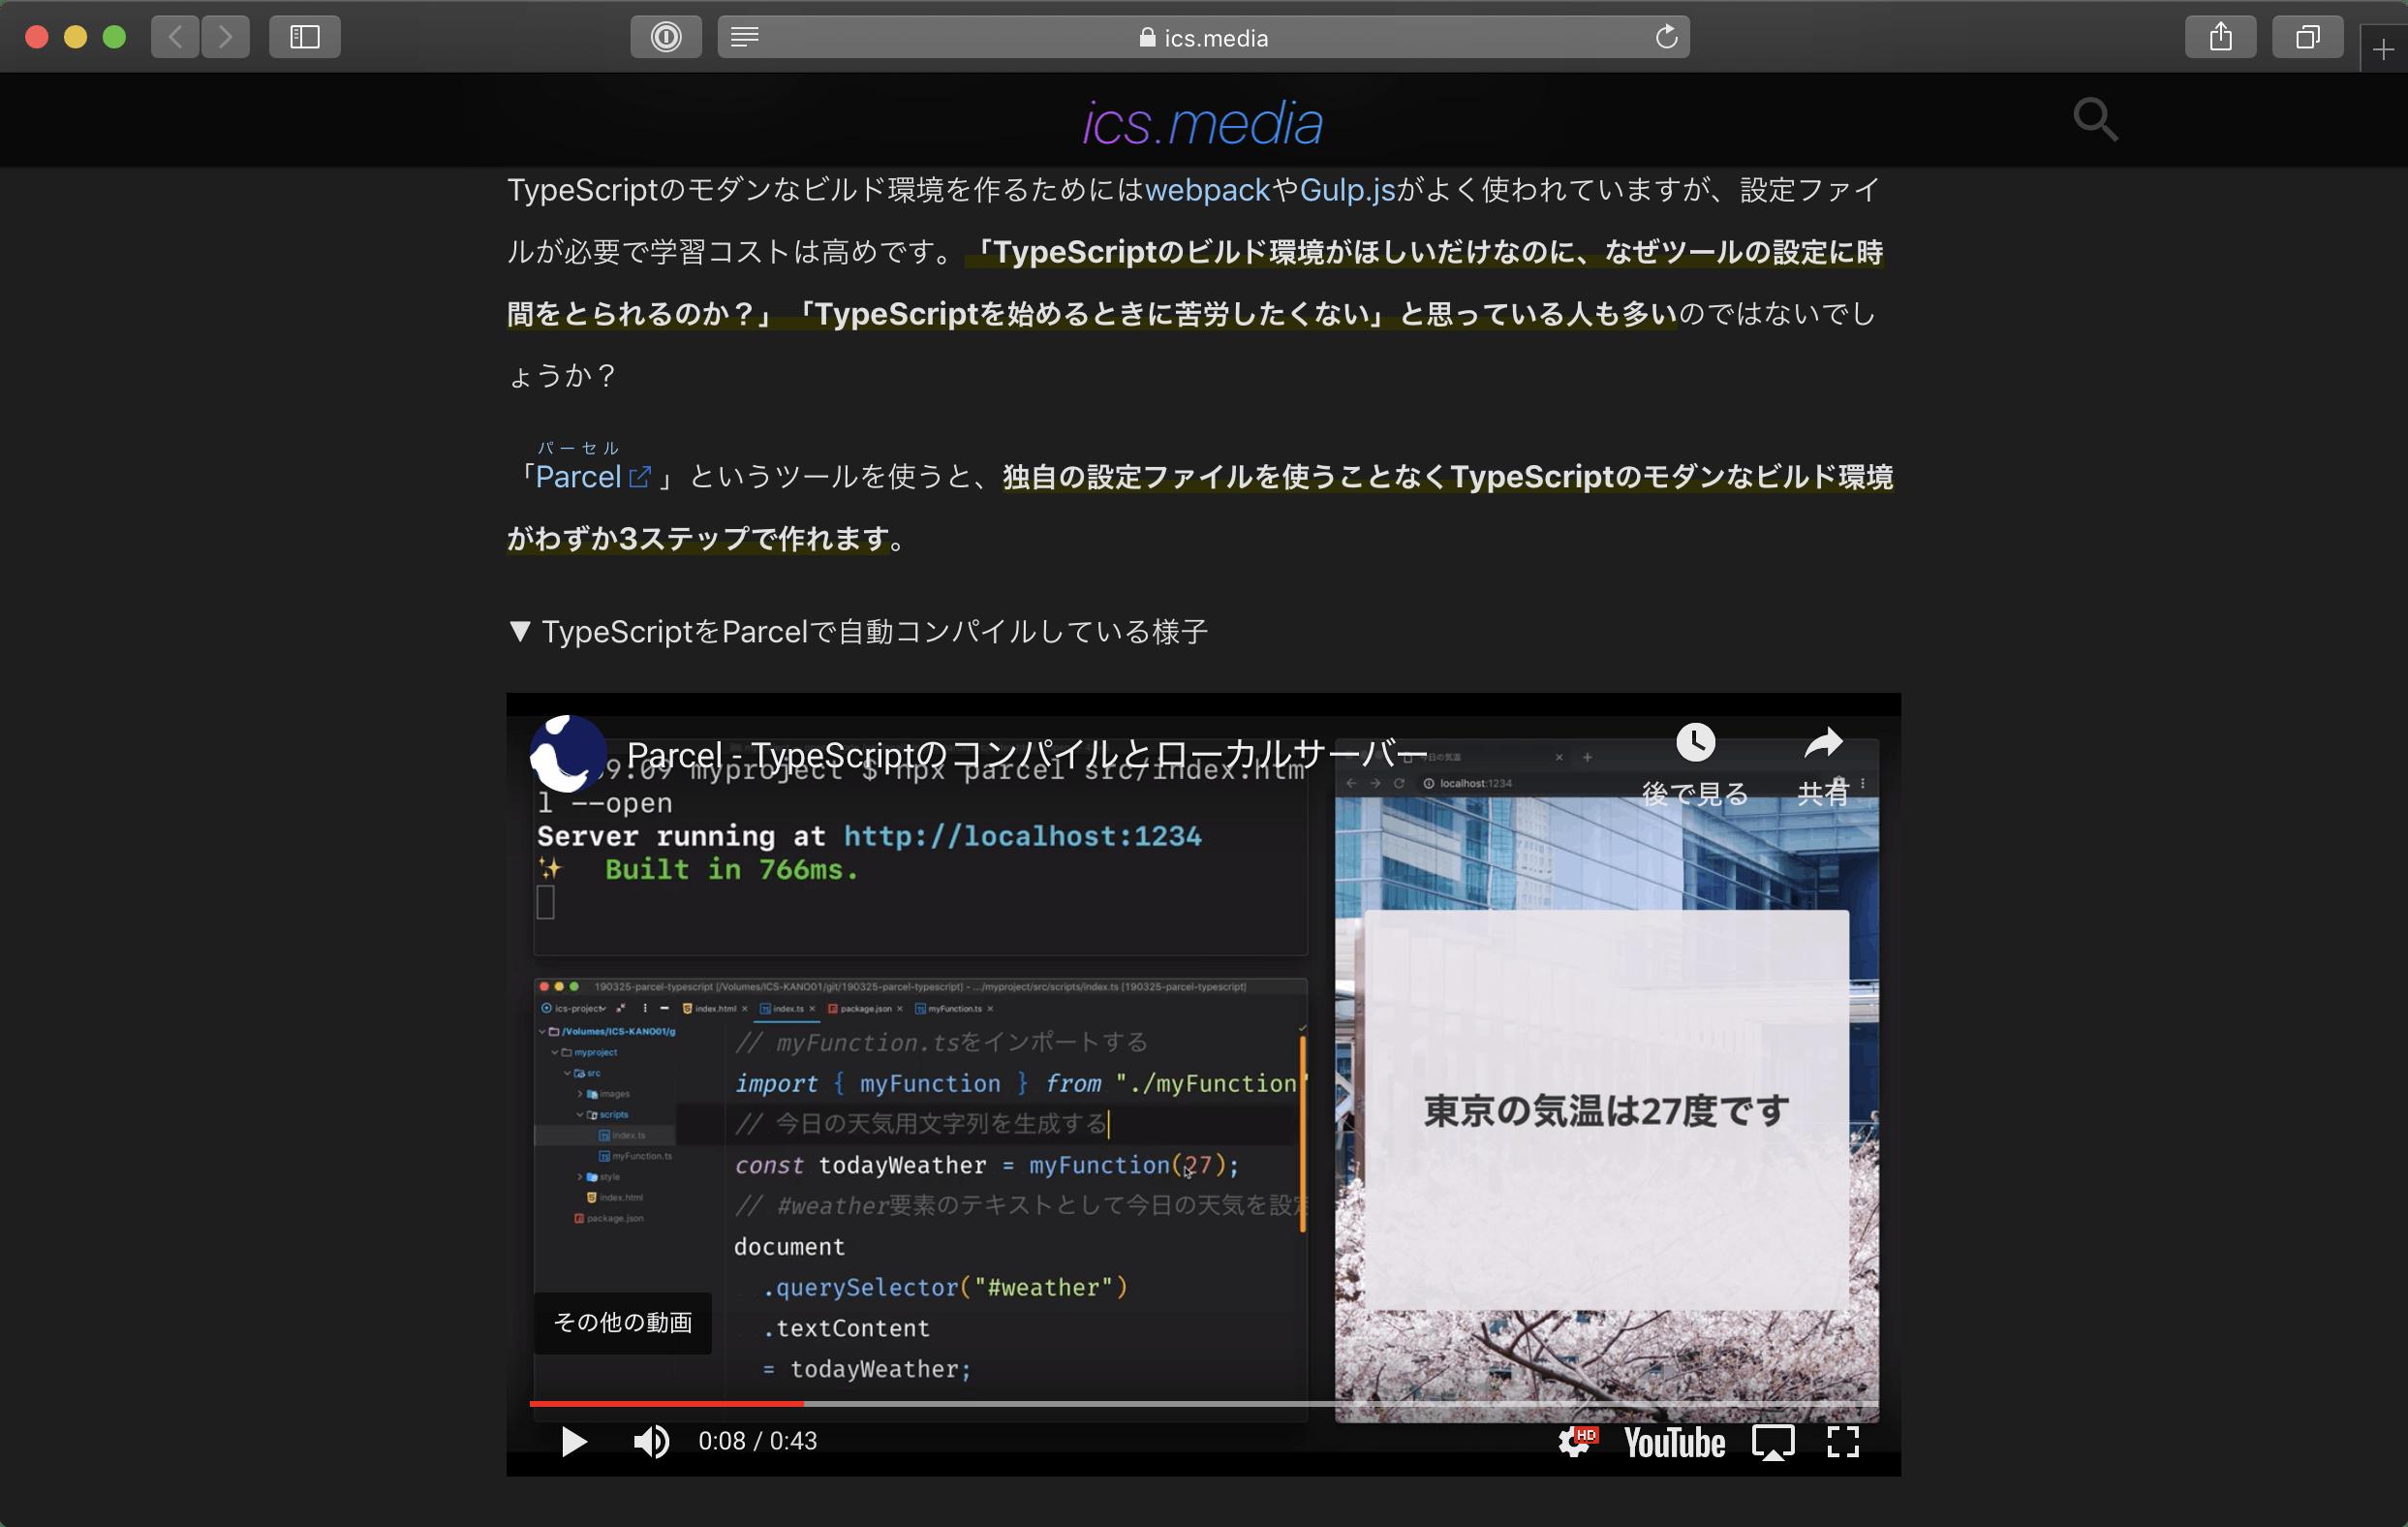 qiita-user-contents imgix net/https%3A%2F%2Fqiita-